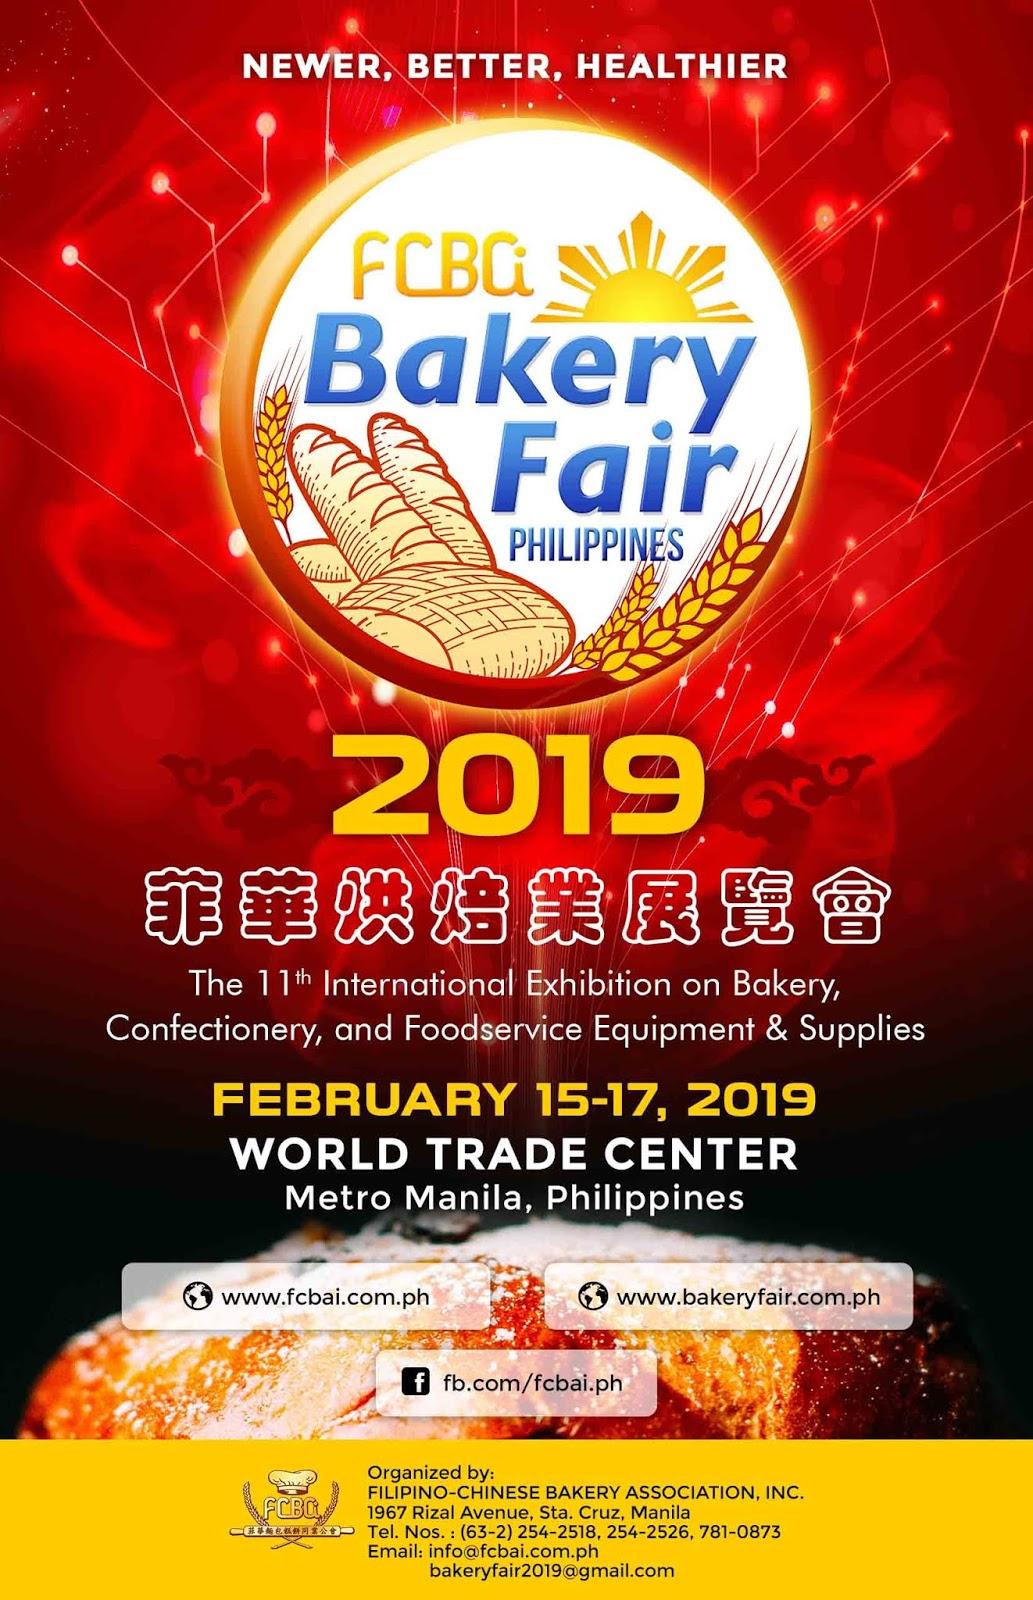 Showbiz Baking Enthusiasts Should Join The Bakery Fair 2019 Trade